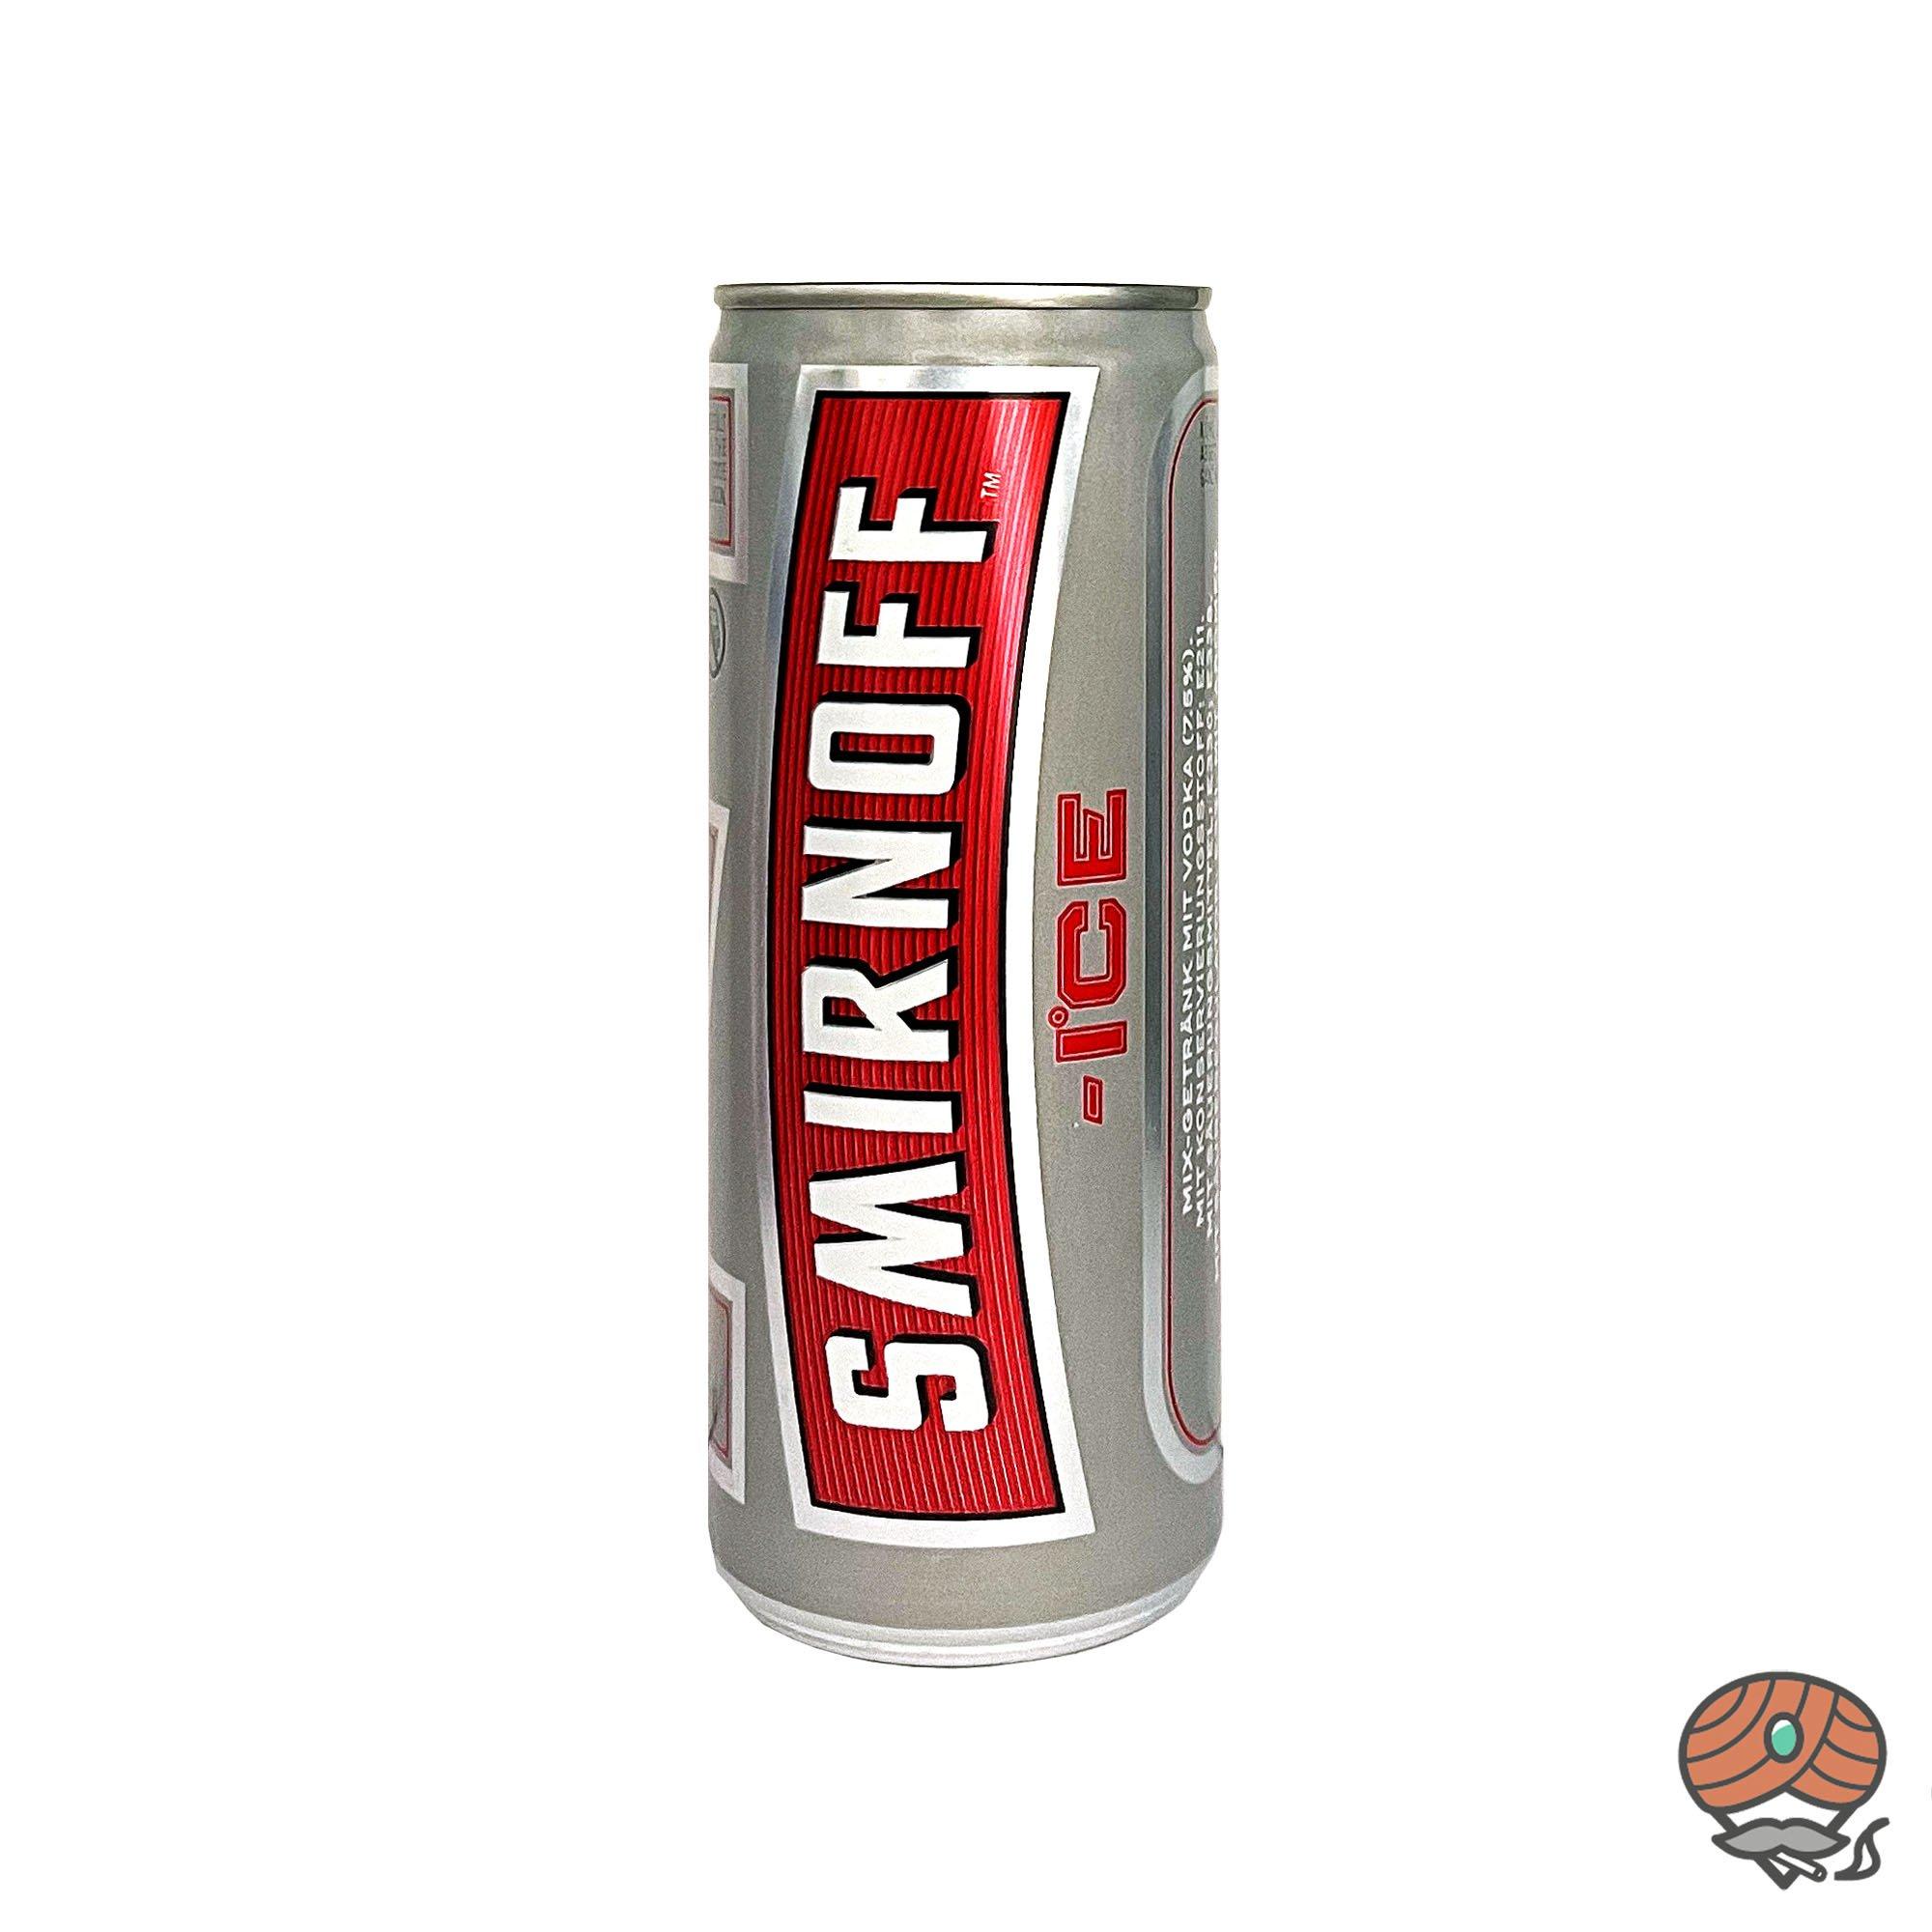 Smirnoff ICE, alc. 3% Vol, inkl. 0,25 Euro Pfand